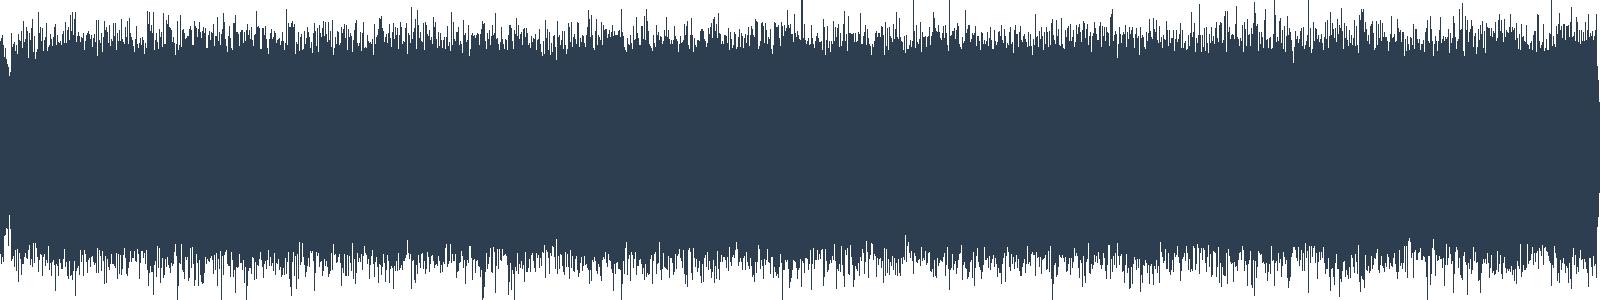 #207 Intervaly s cyklokuriérmi waveform